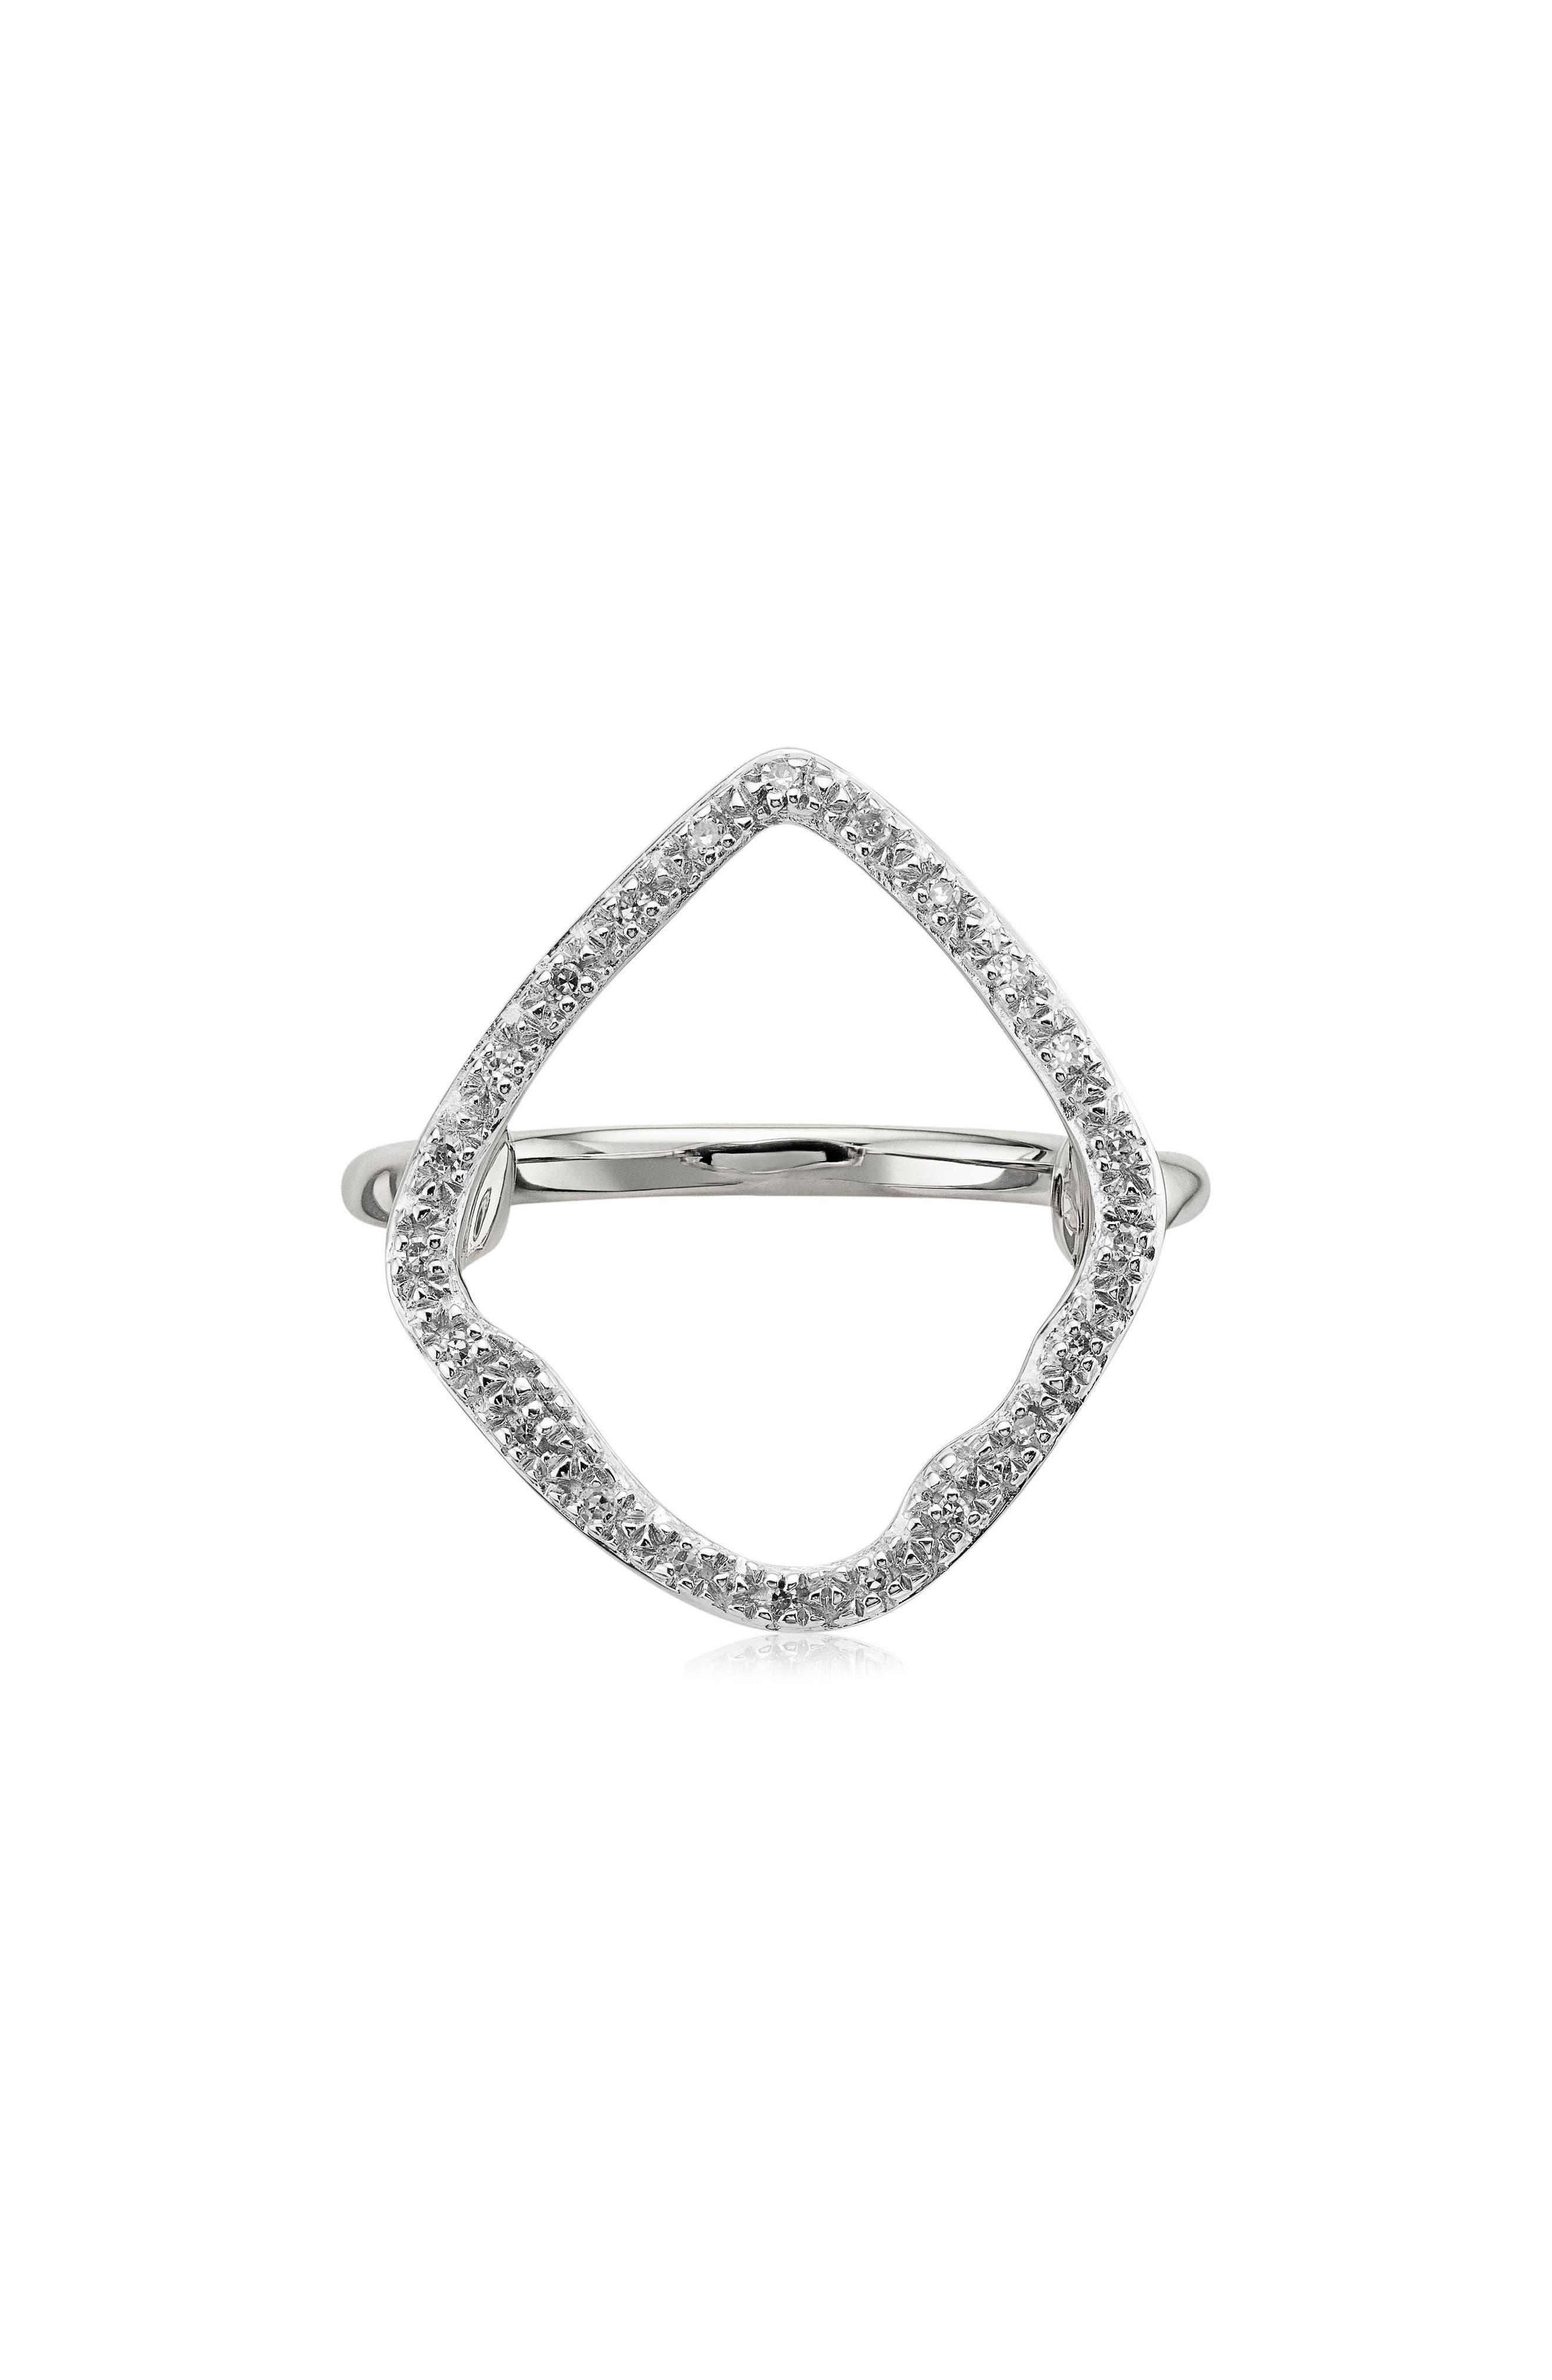 MONICA VINADER, Riva Hoop Diamond Ring, Main thumbnail 1, color, SILVER